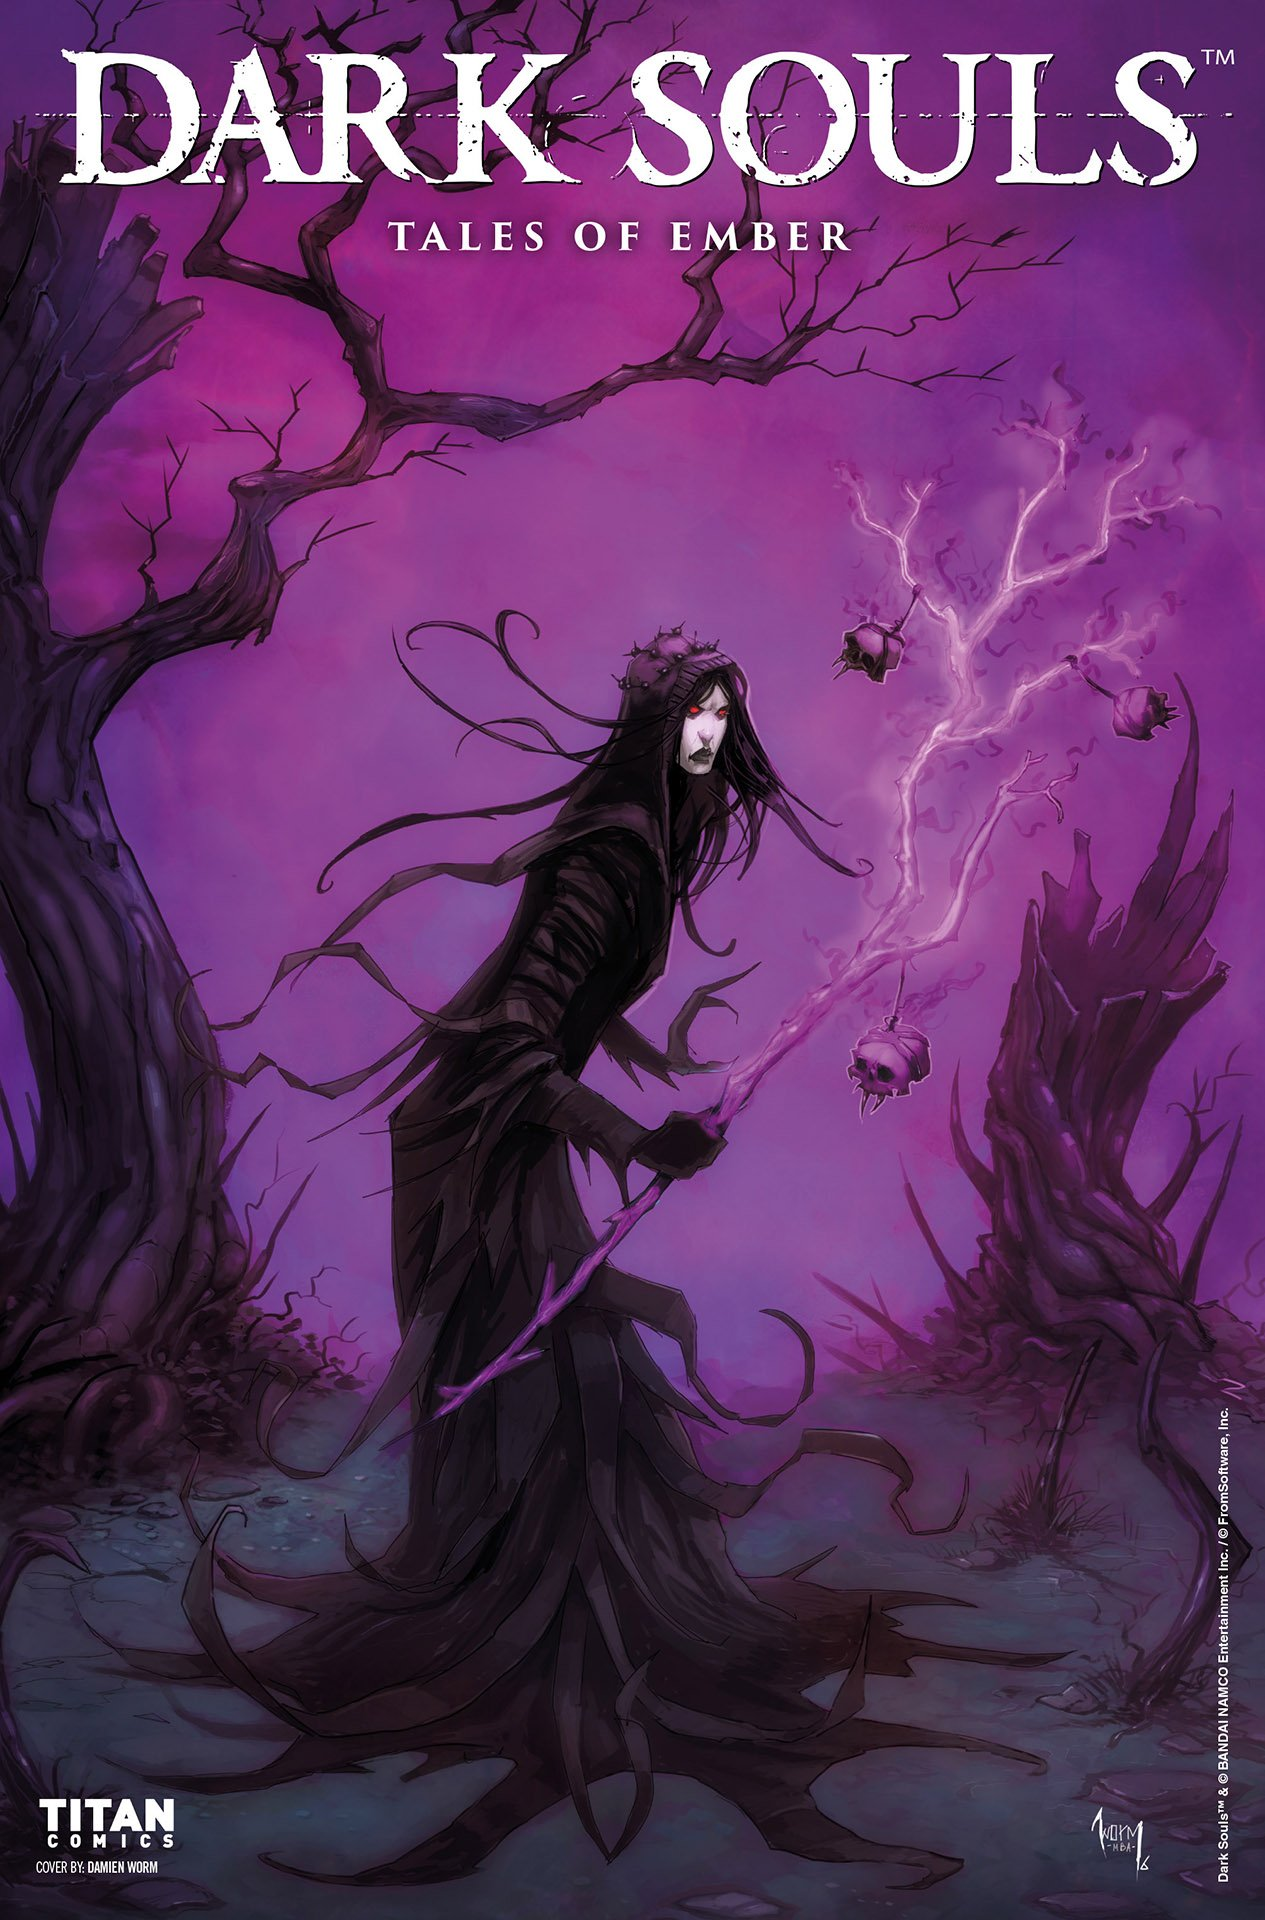 Dark Souls: Tales of Ember 001 (April 2017) (cover a)